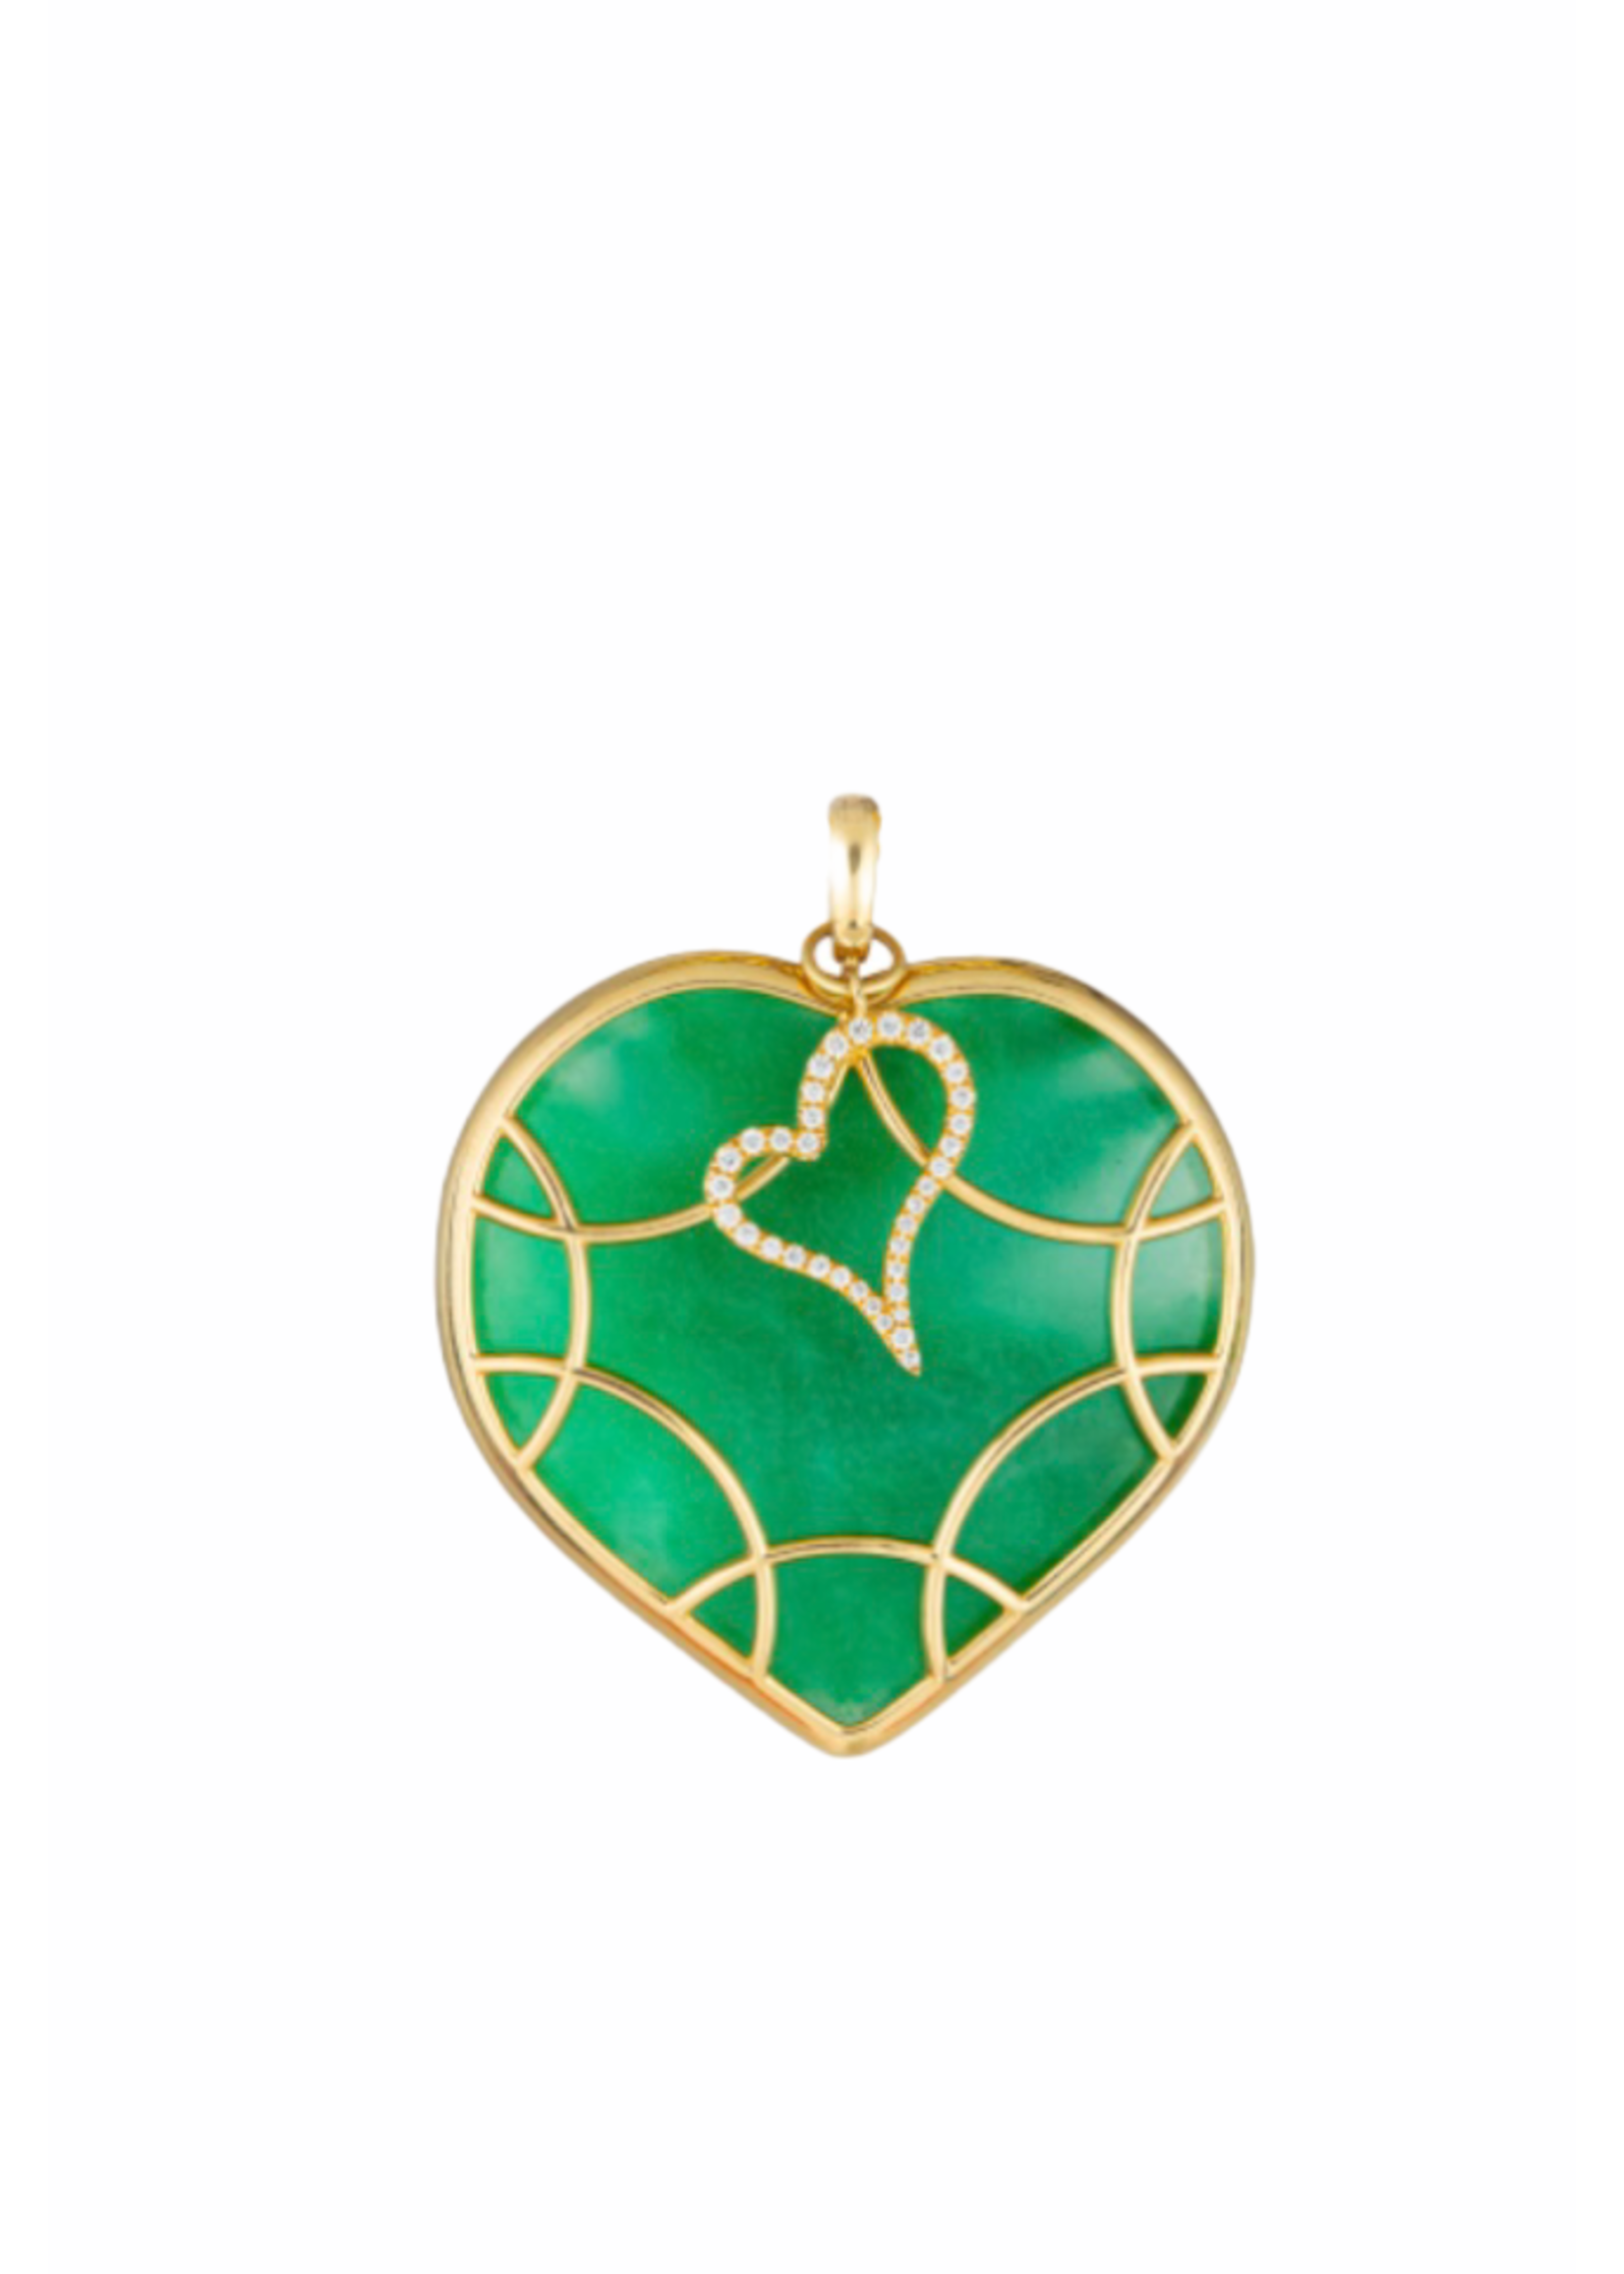 Have a Heart Columbian Emerald Heart